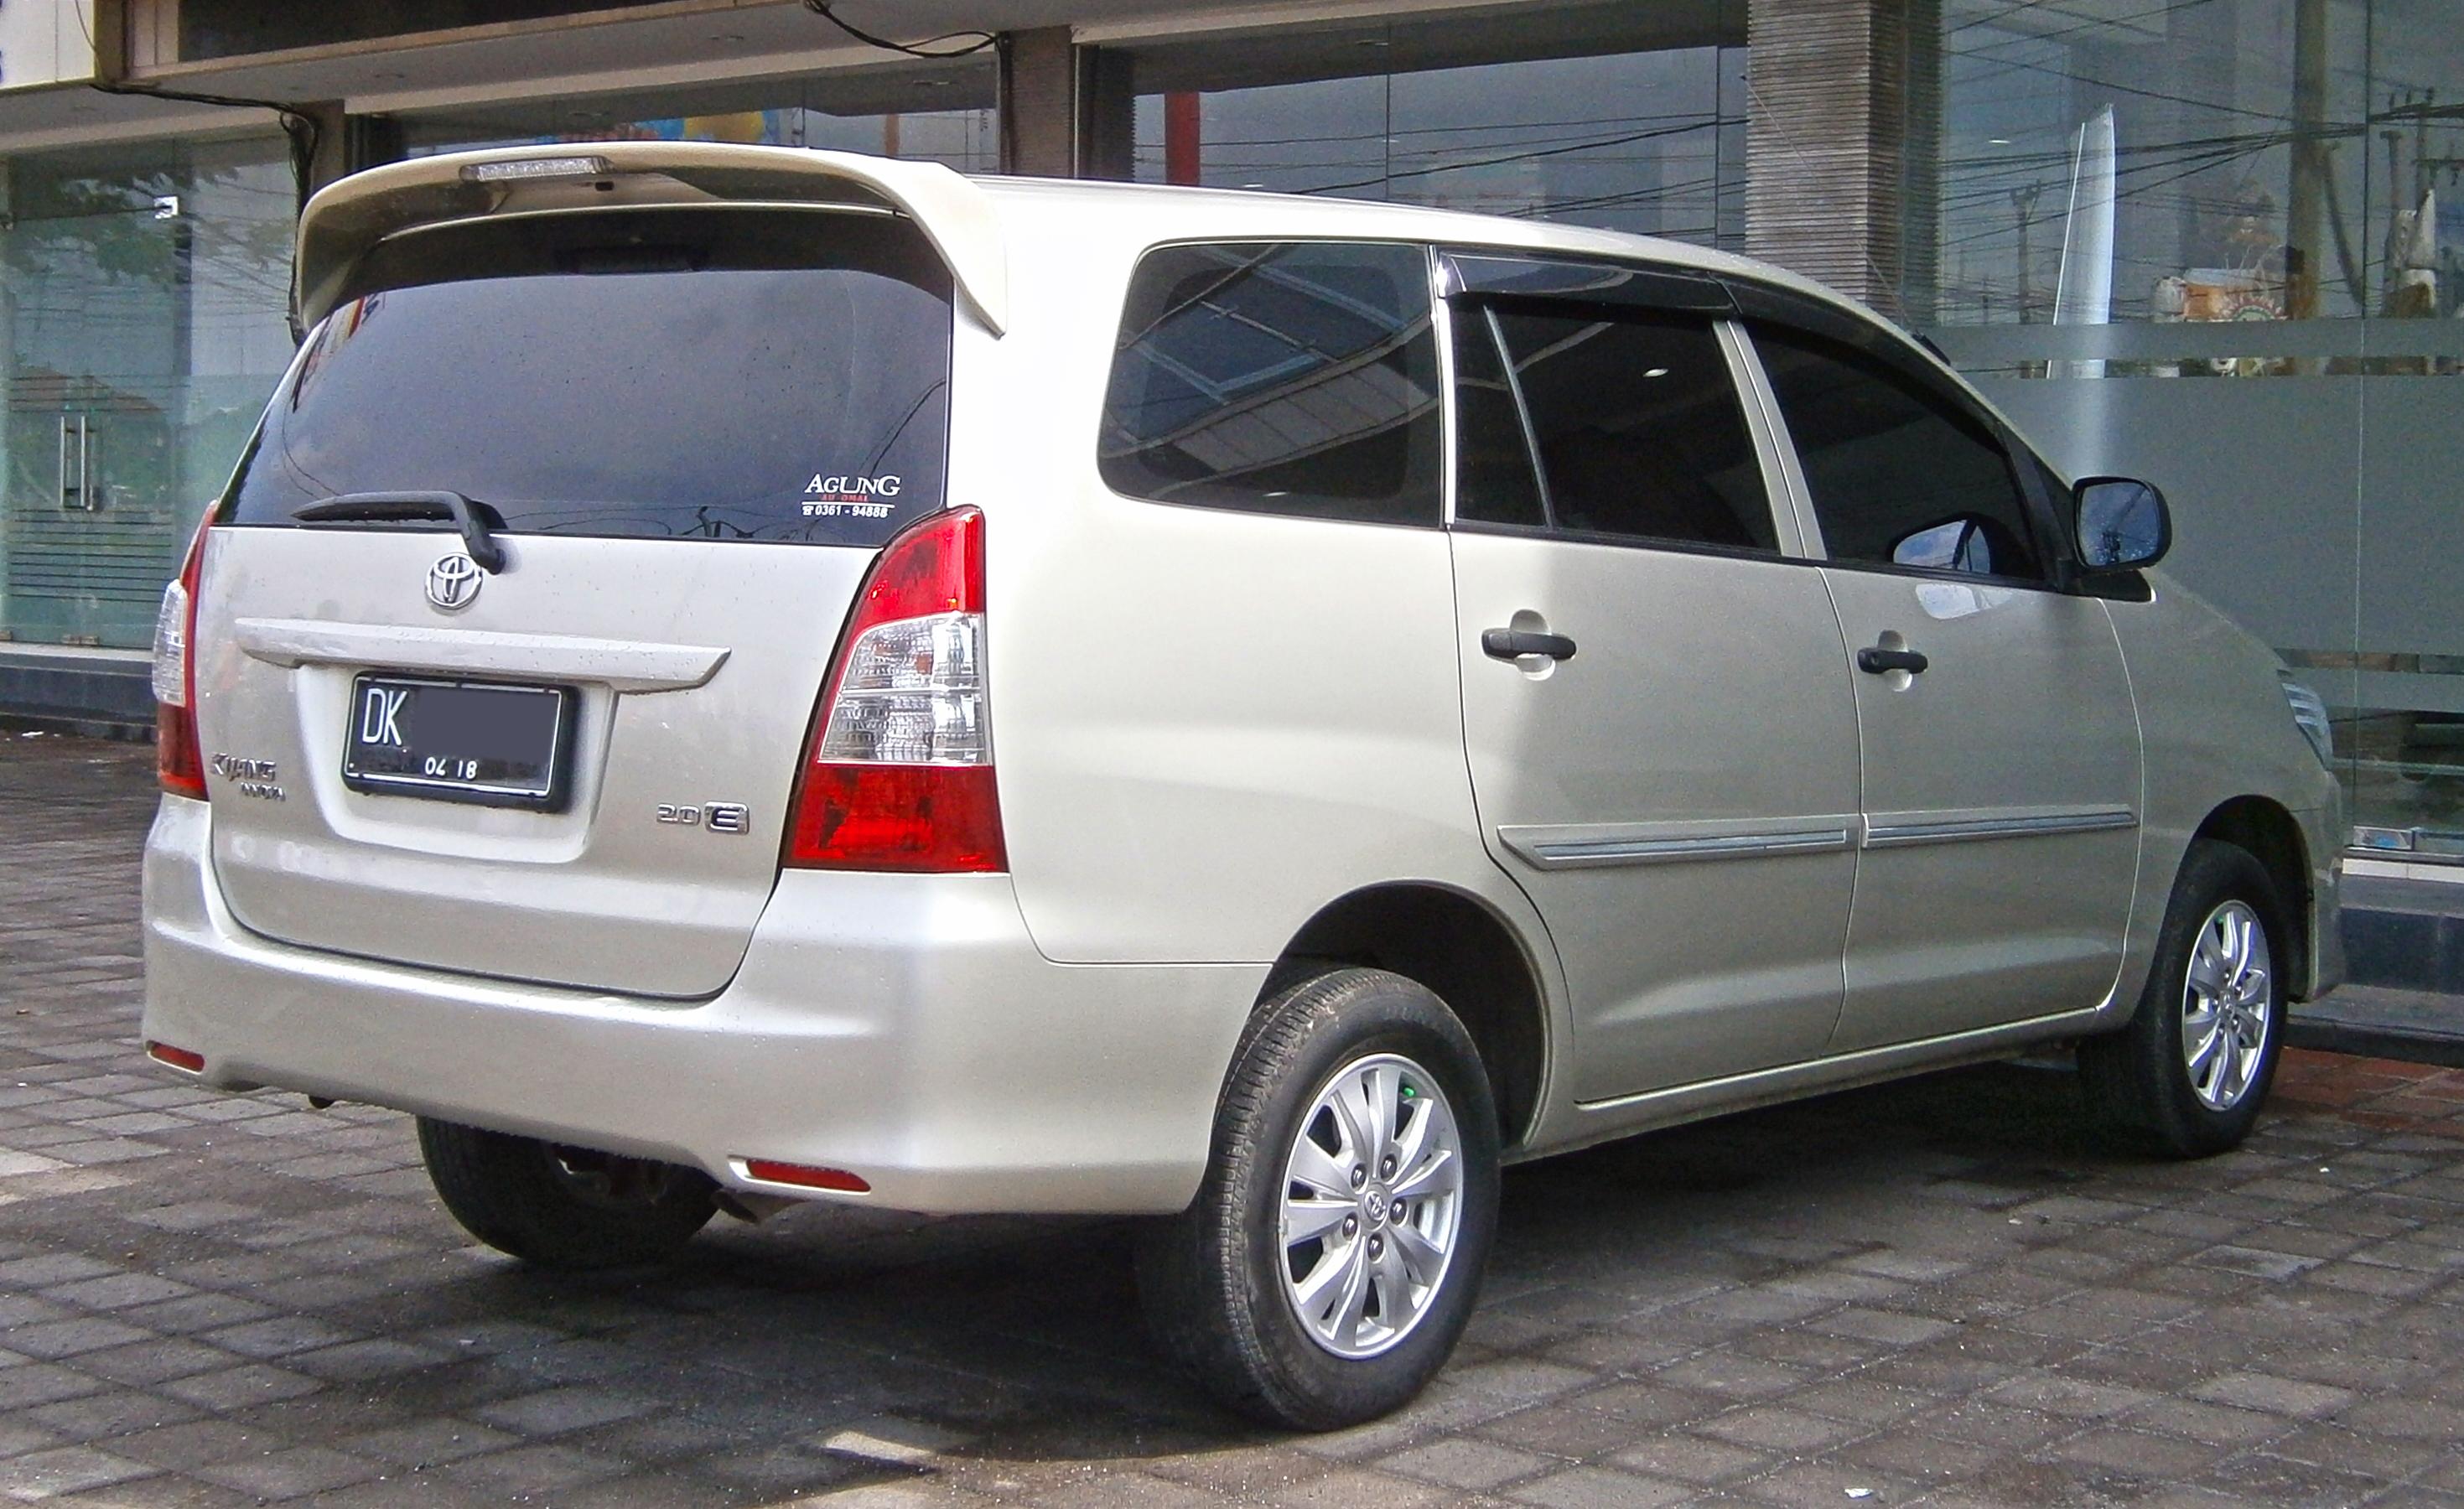 File:2013 Toyota Kijang Innova 2.0E In Kuta, Bali